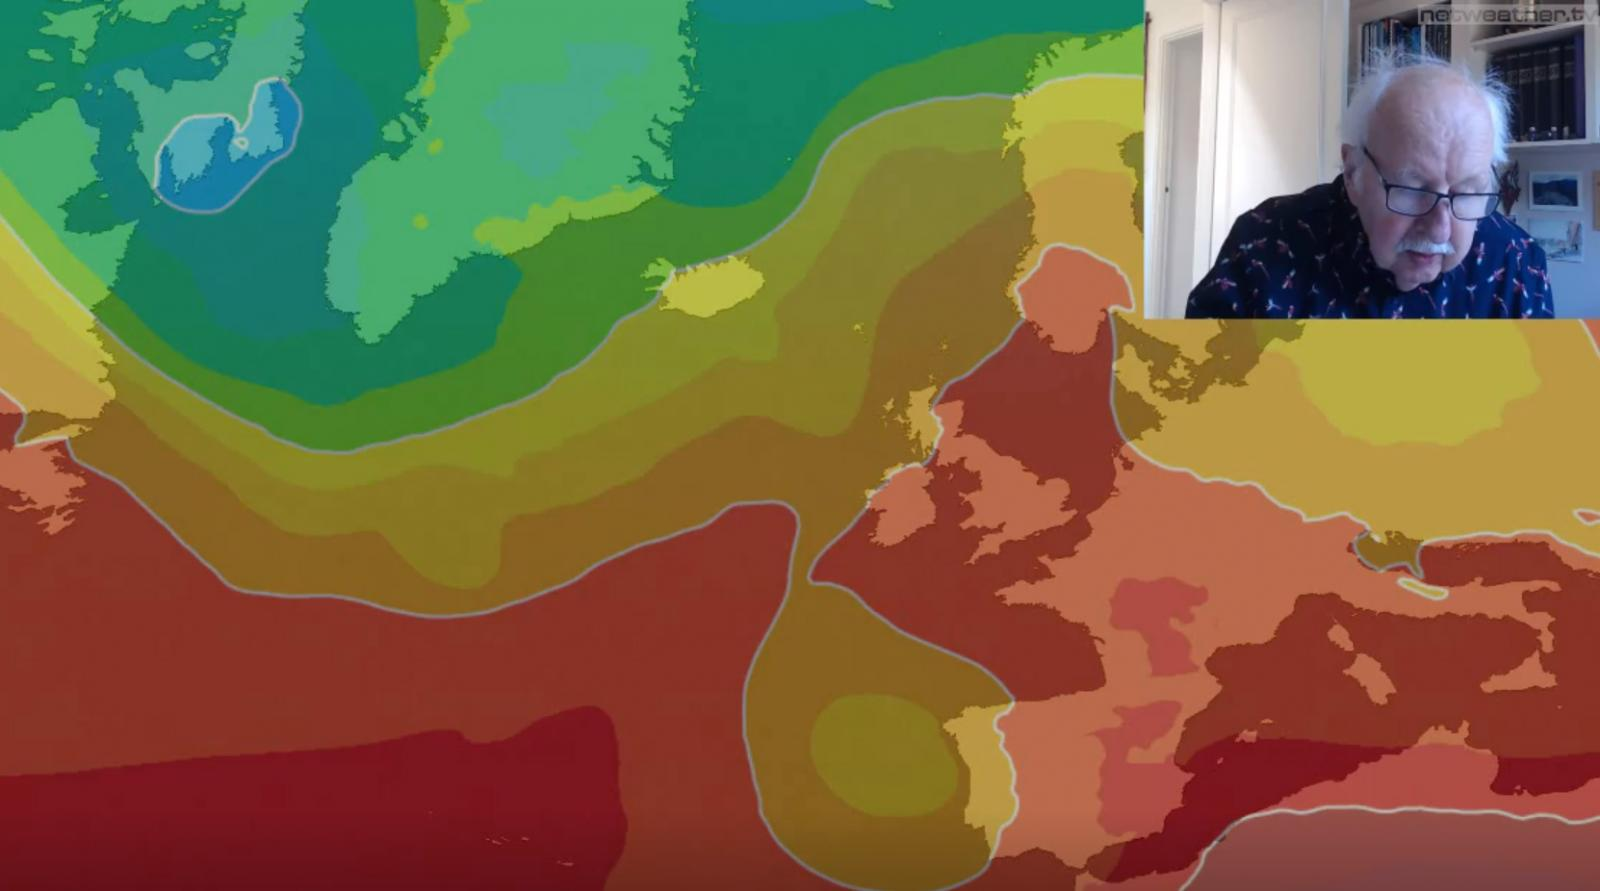 Michael Fish: Heatwave On The Way